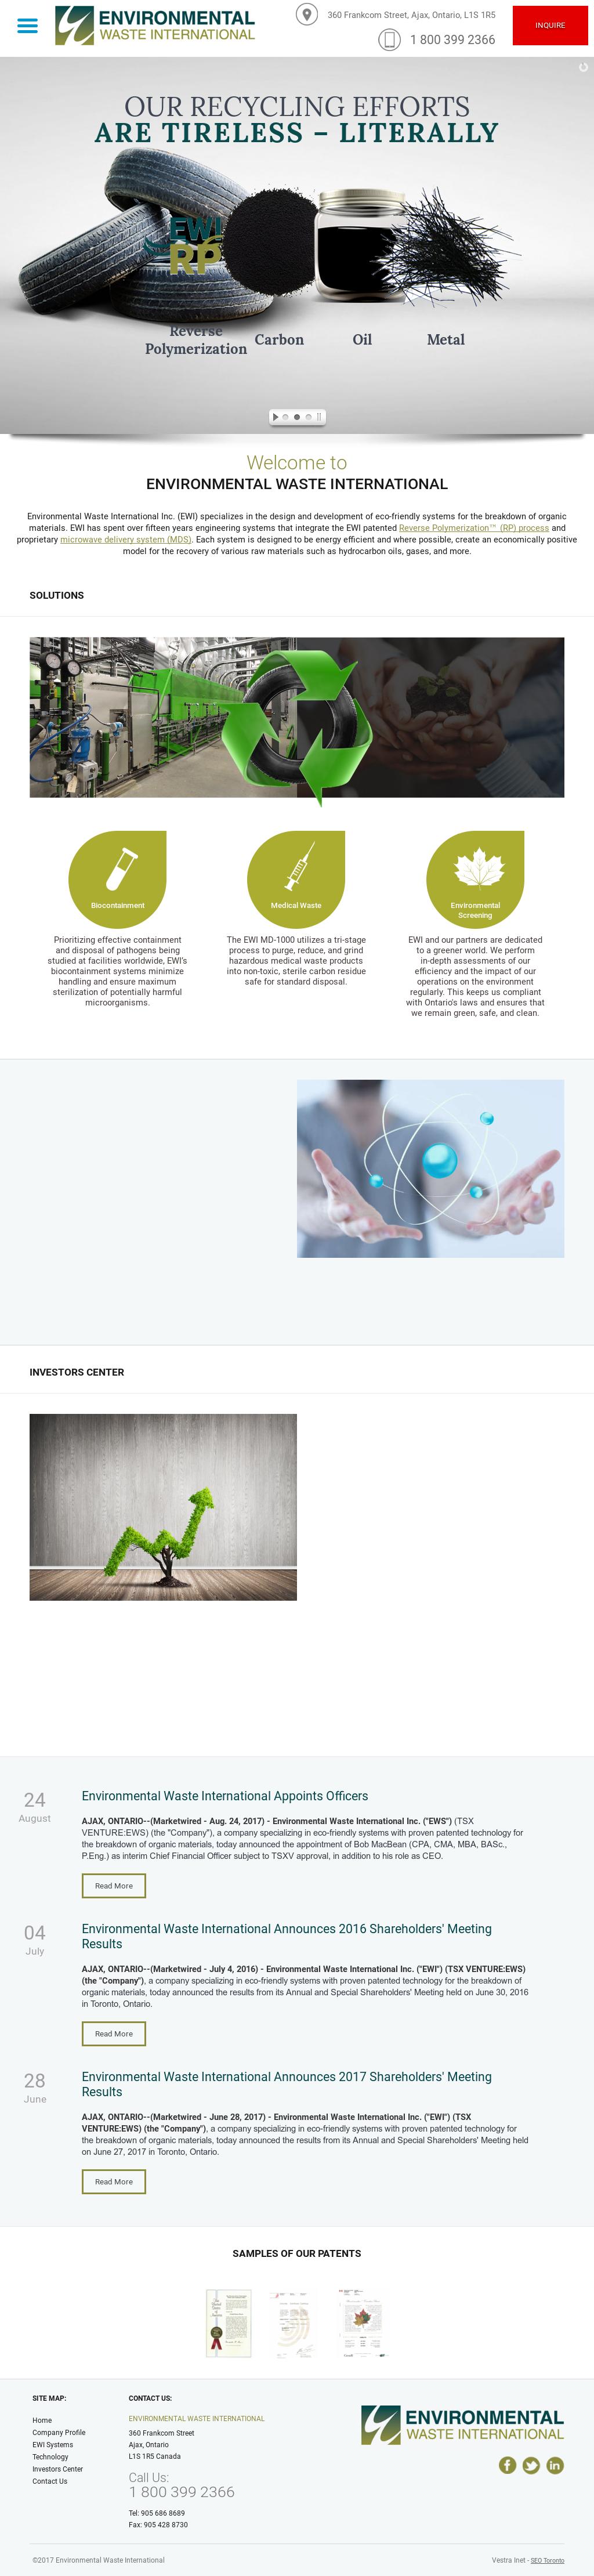 Ewi Competitors, Revenue and Employees - Owler Company Profile